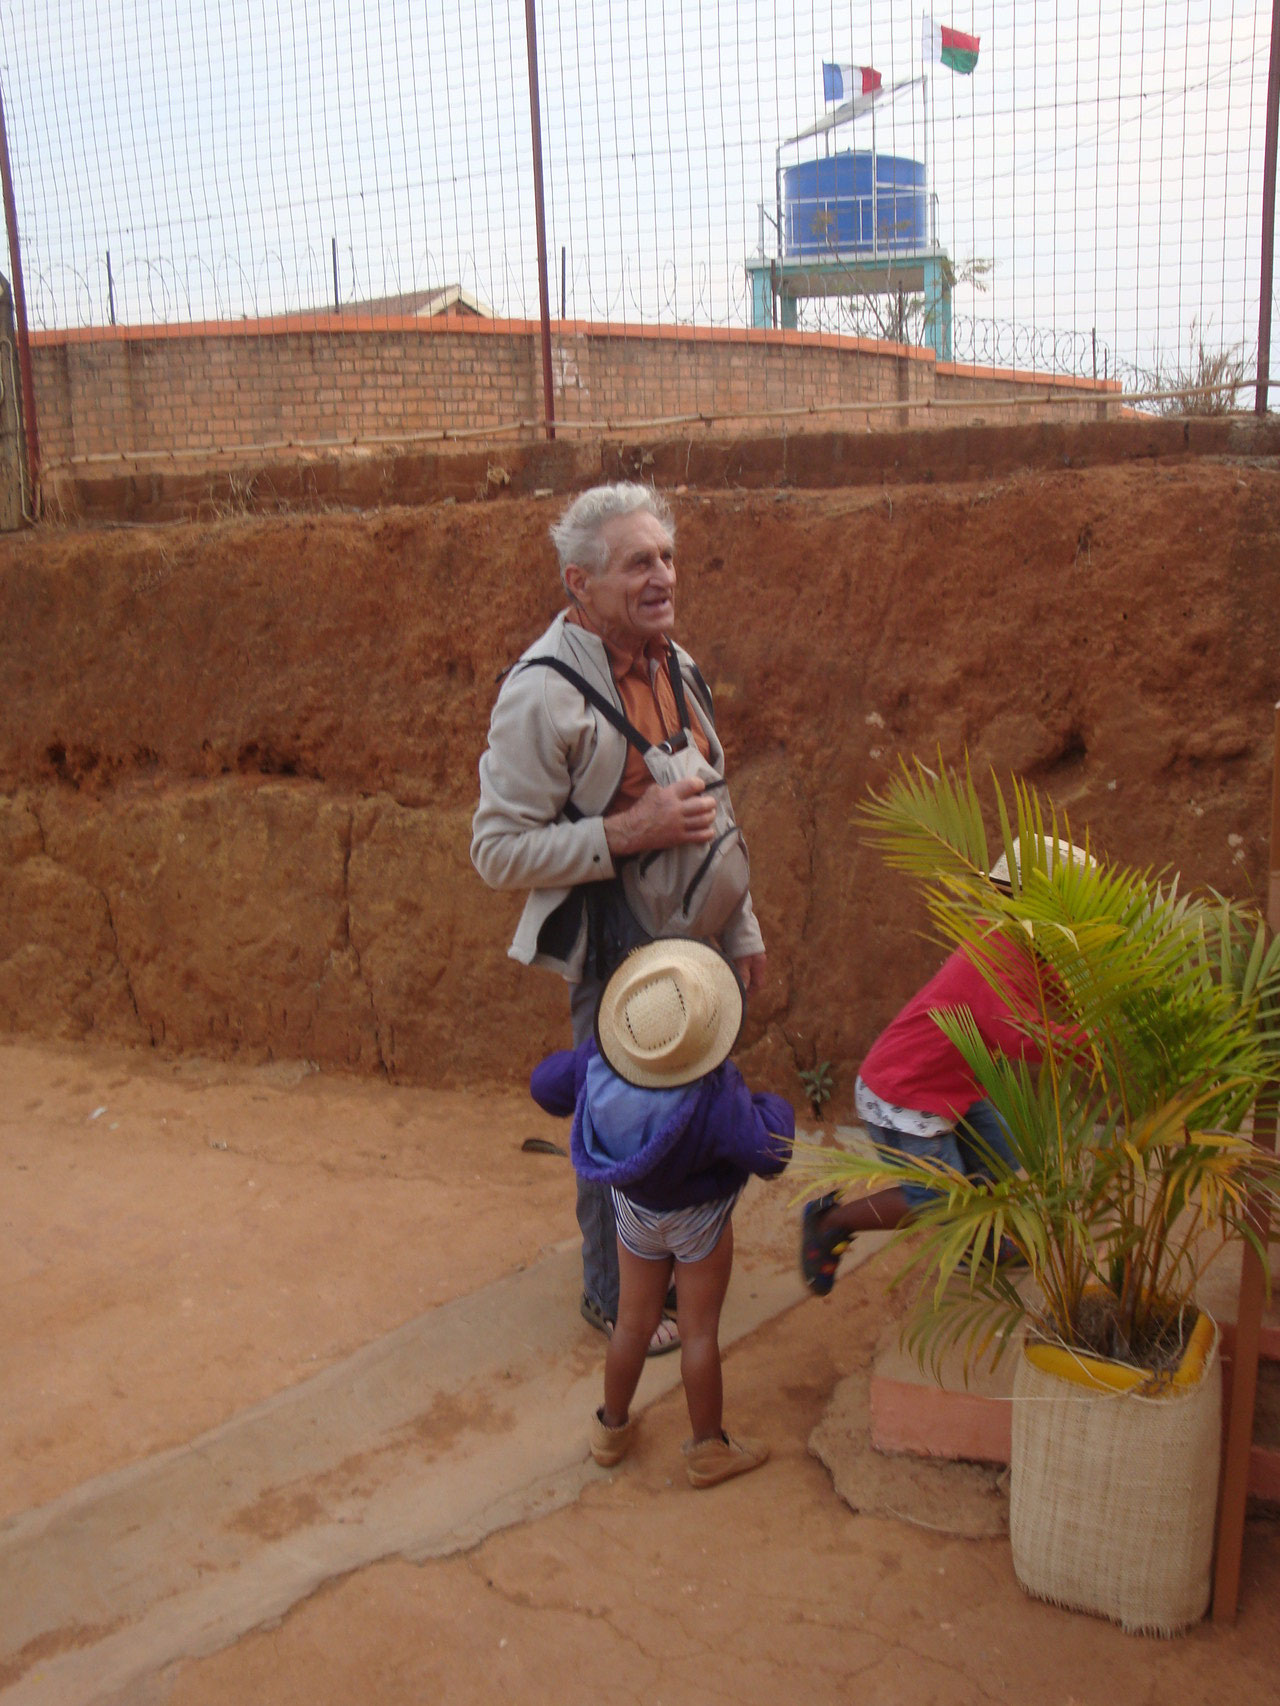 Visite d'Aina -  Voyage solidaire